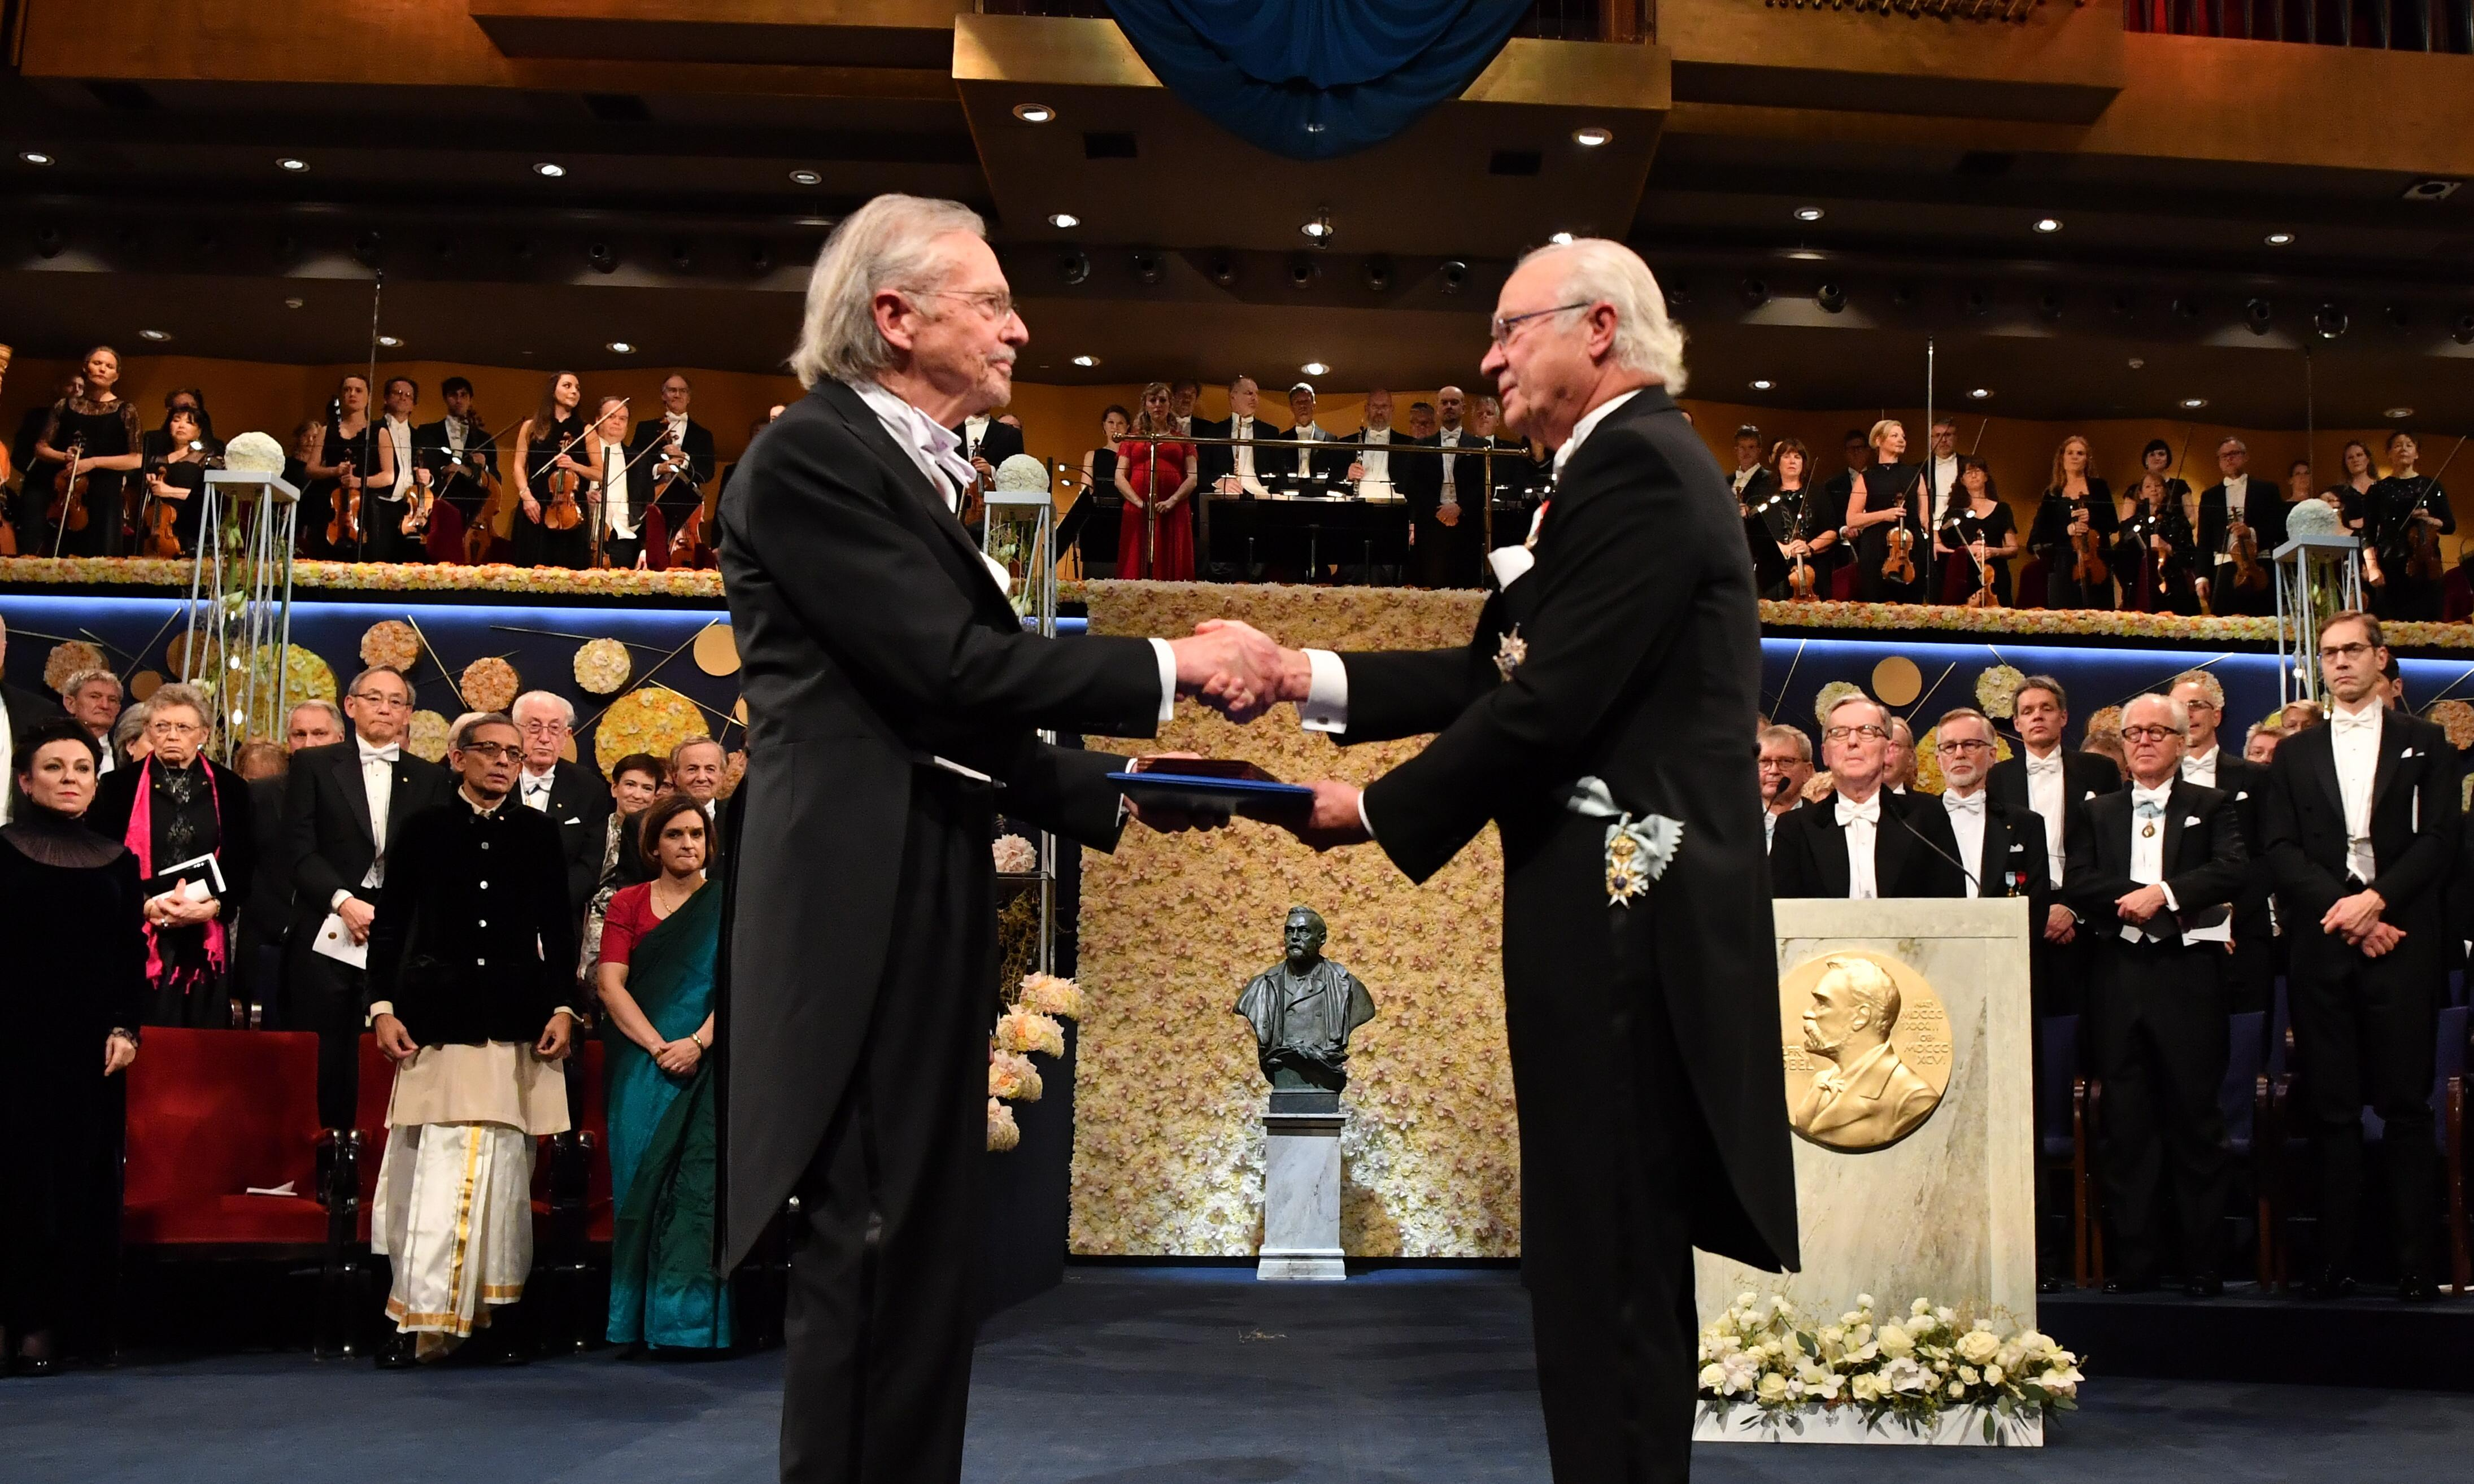 Protests grow as Peter Handke receives Nobel medal in Sweden